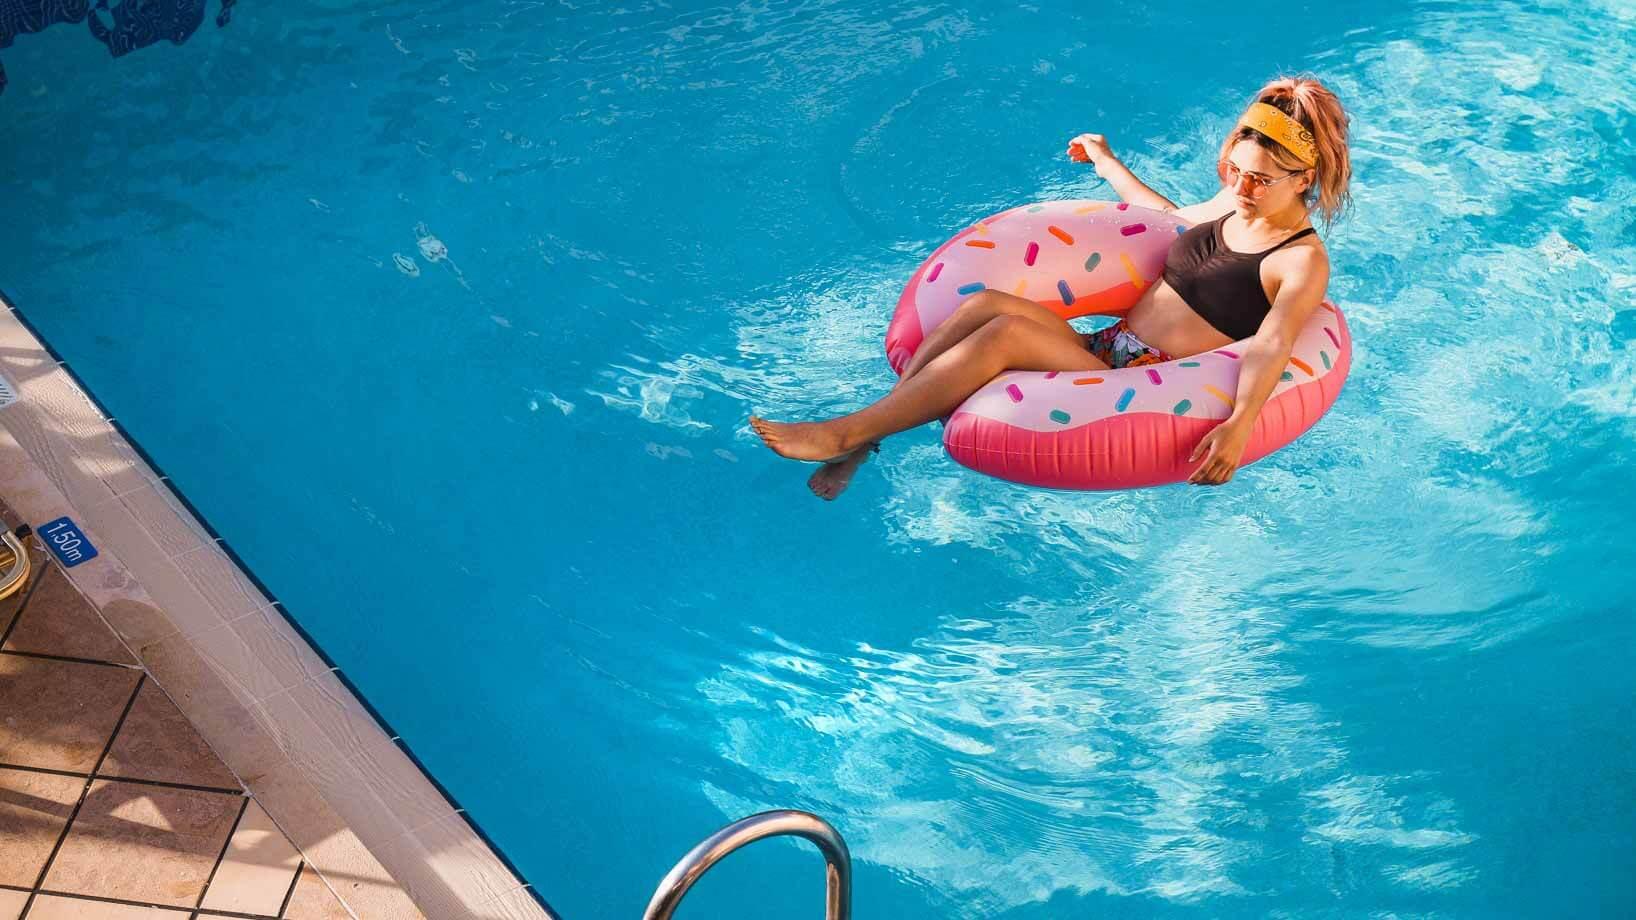 Elotis Suites Pool. 5 Crete Restaurants to Visit on Your Greek Island Vacation